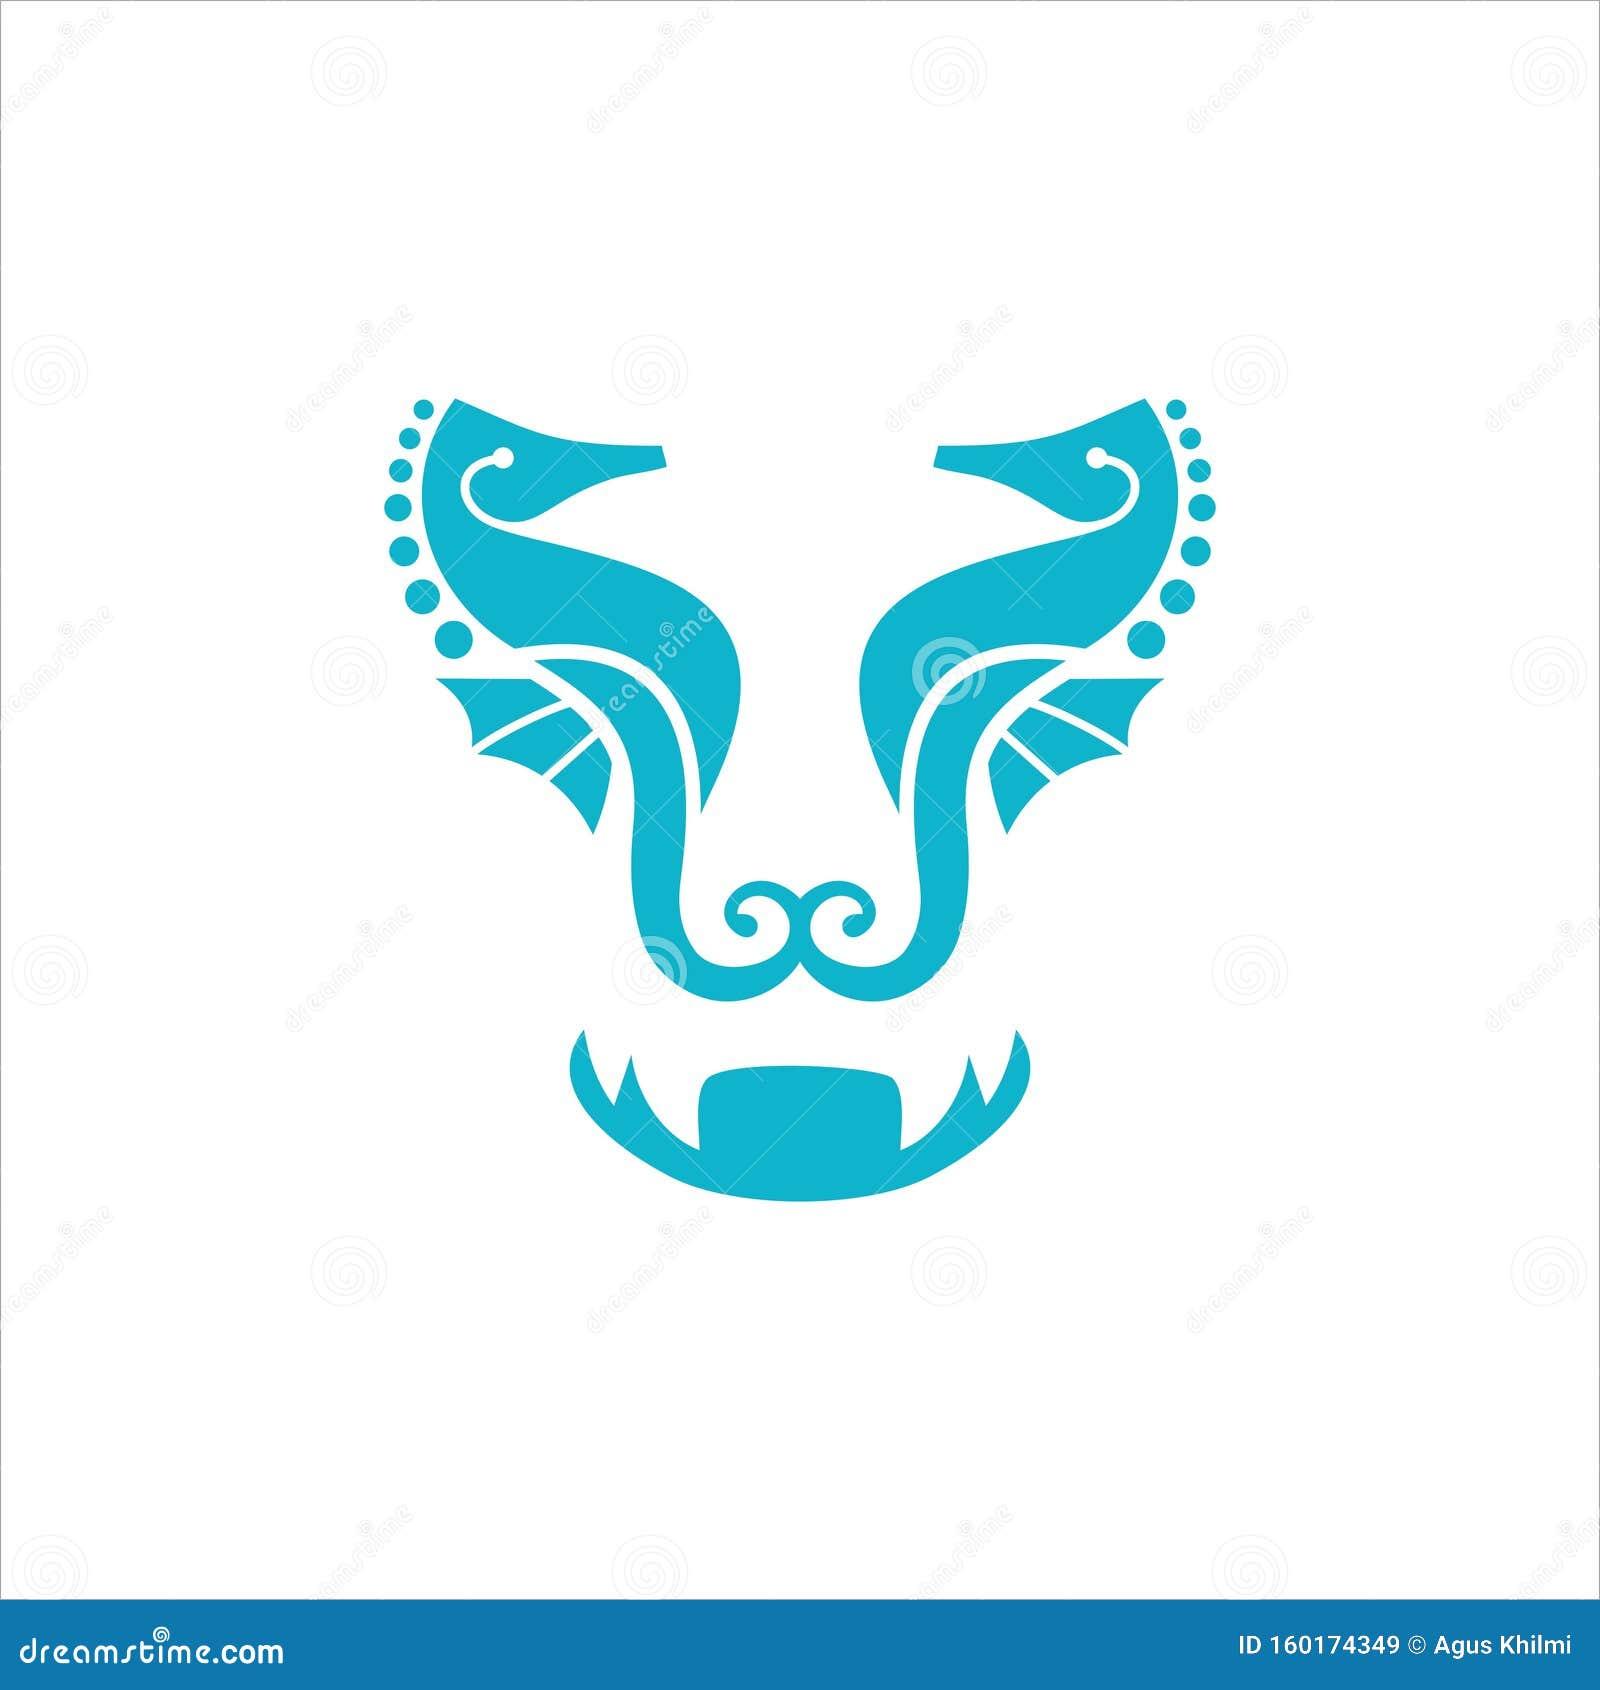 Seahorse Logo Design Vector Stock Vector Illustration Of Abstract Animal 160174349